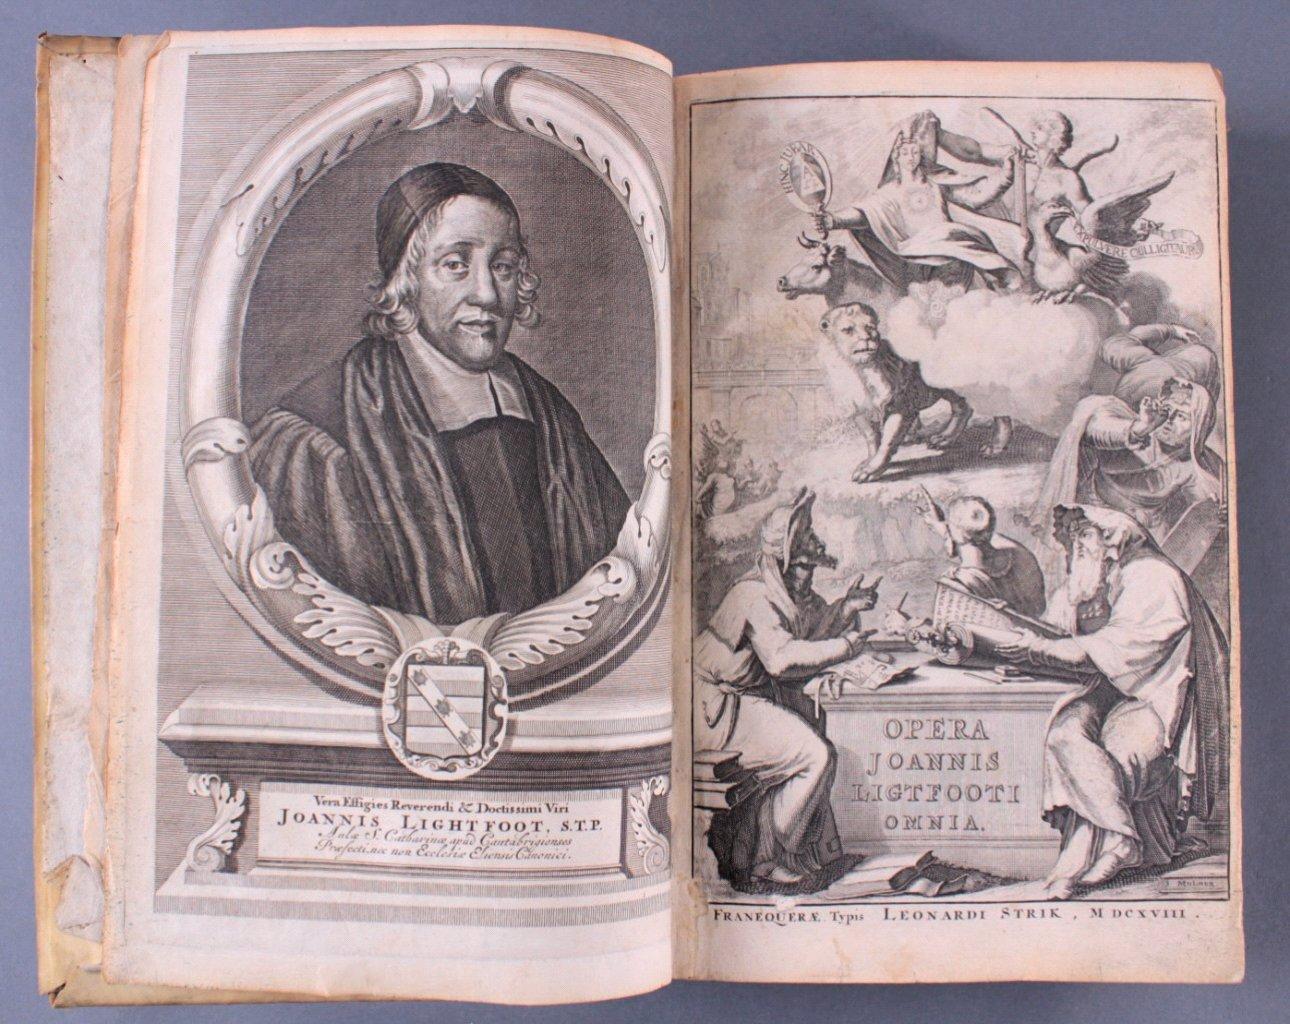 2 Ausgaben Joannis Lightfooti, 1618-4